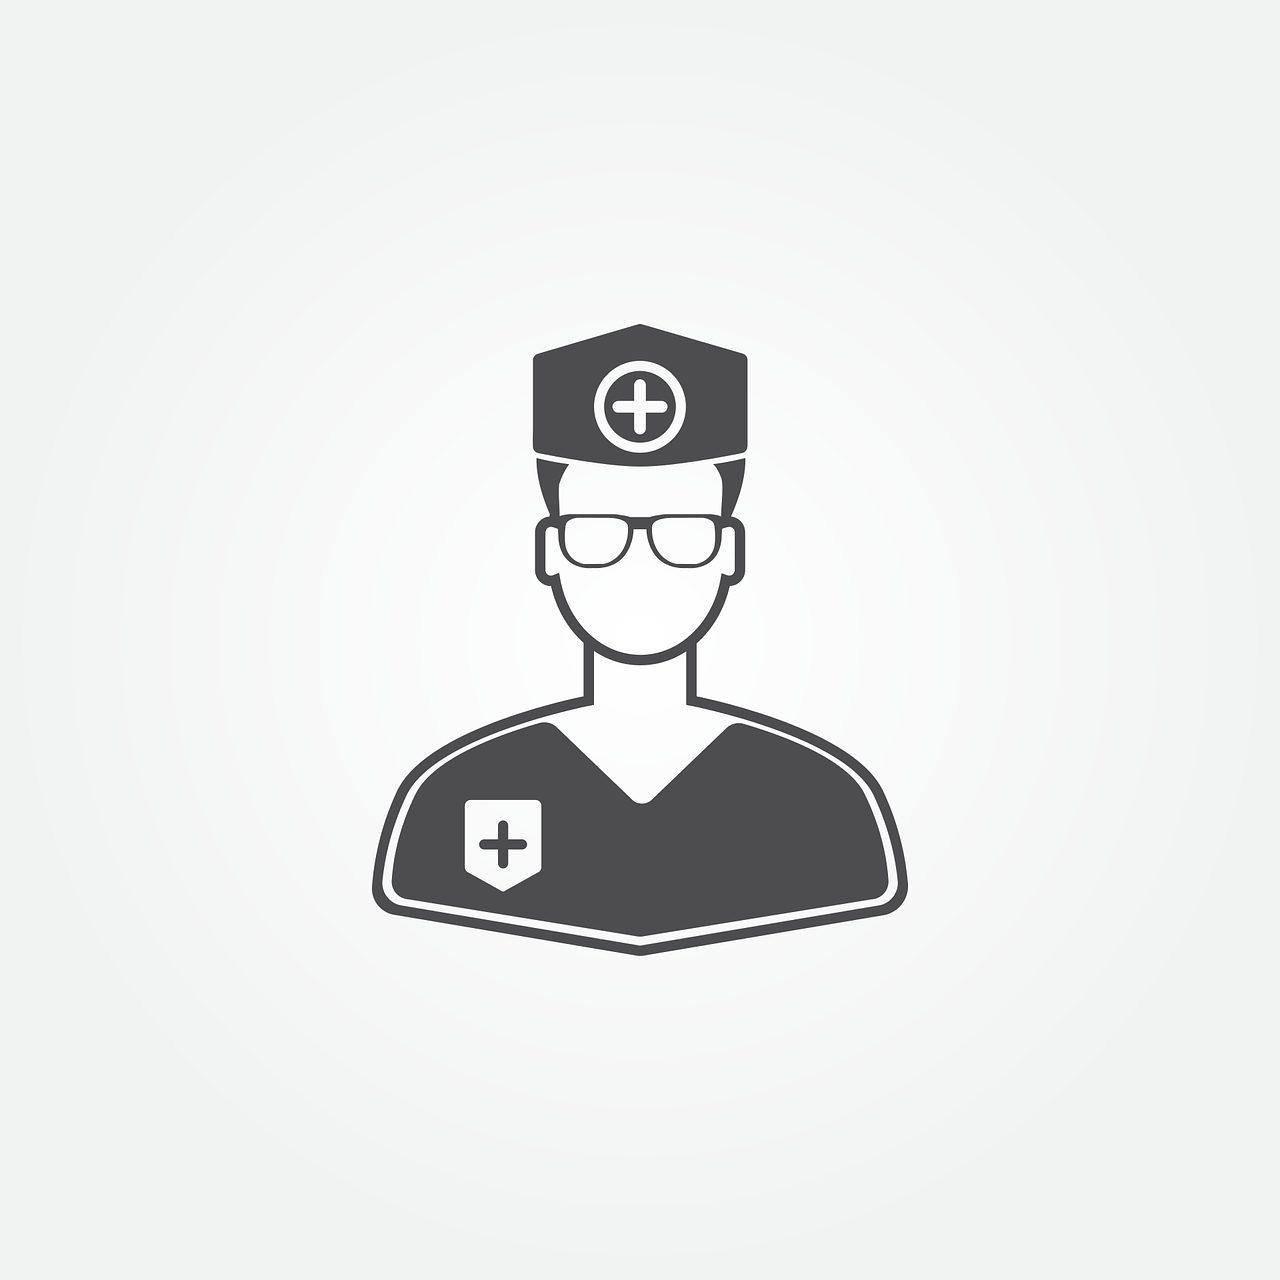 Lobbezoo-Scholte A M narcose tandarts kosten